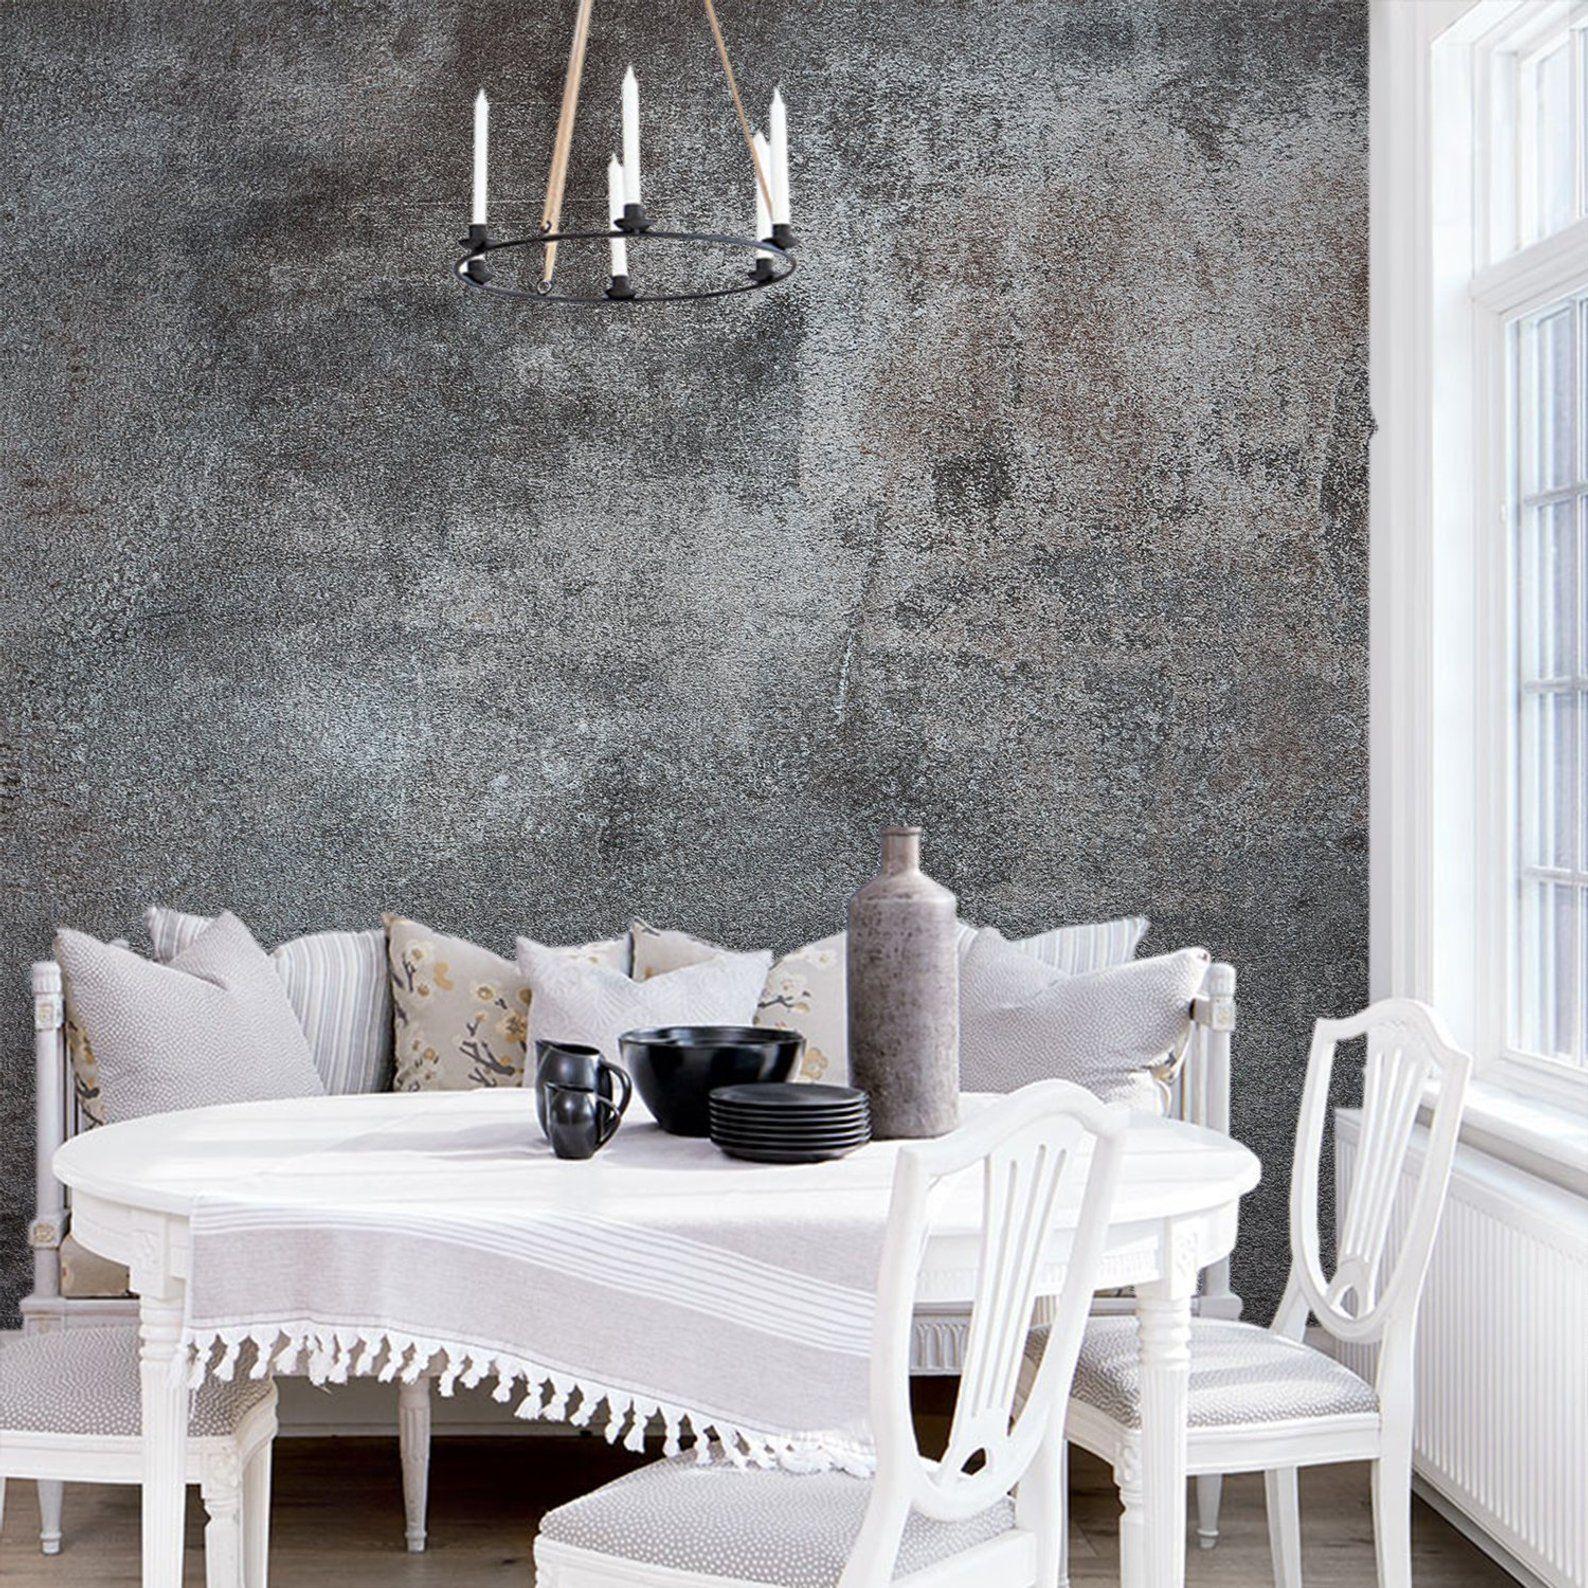 Dark Gray Grunge Wall Mural Peel And Stick Wallpaper Black Etsy White Decor Black And White Decor Cement Walls